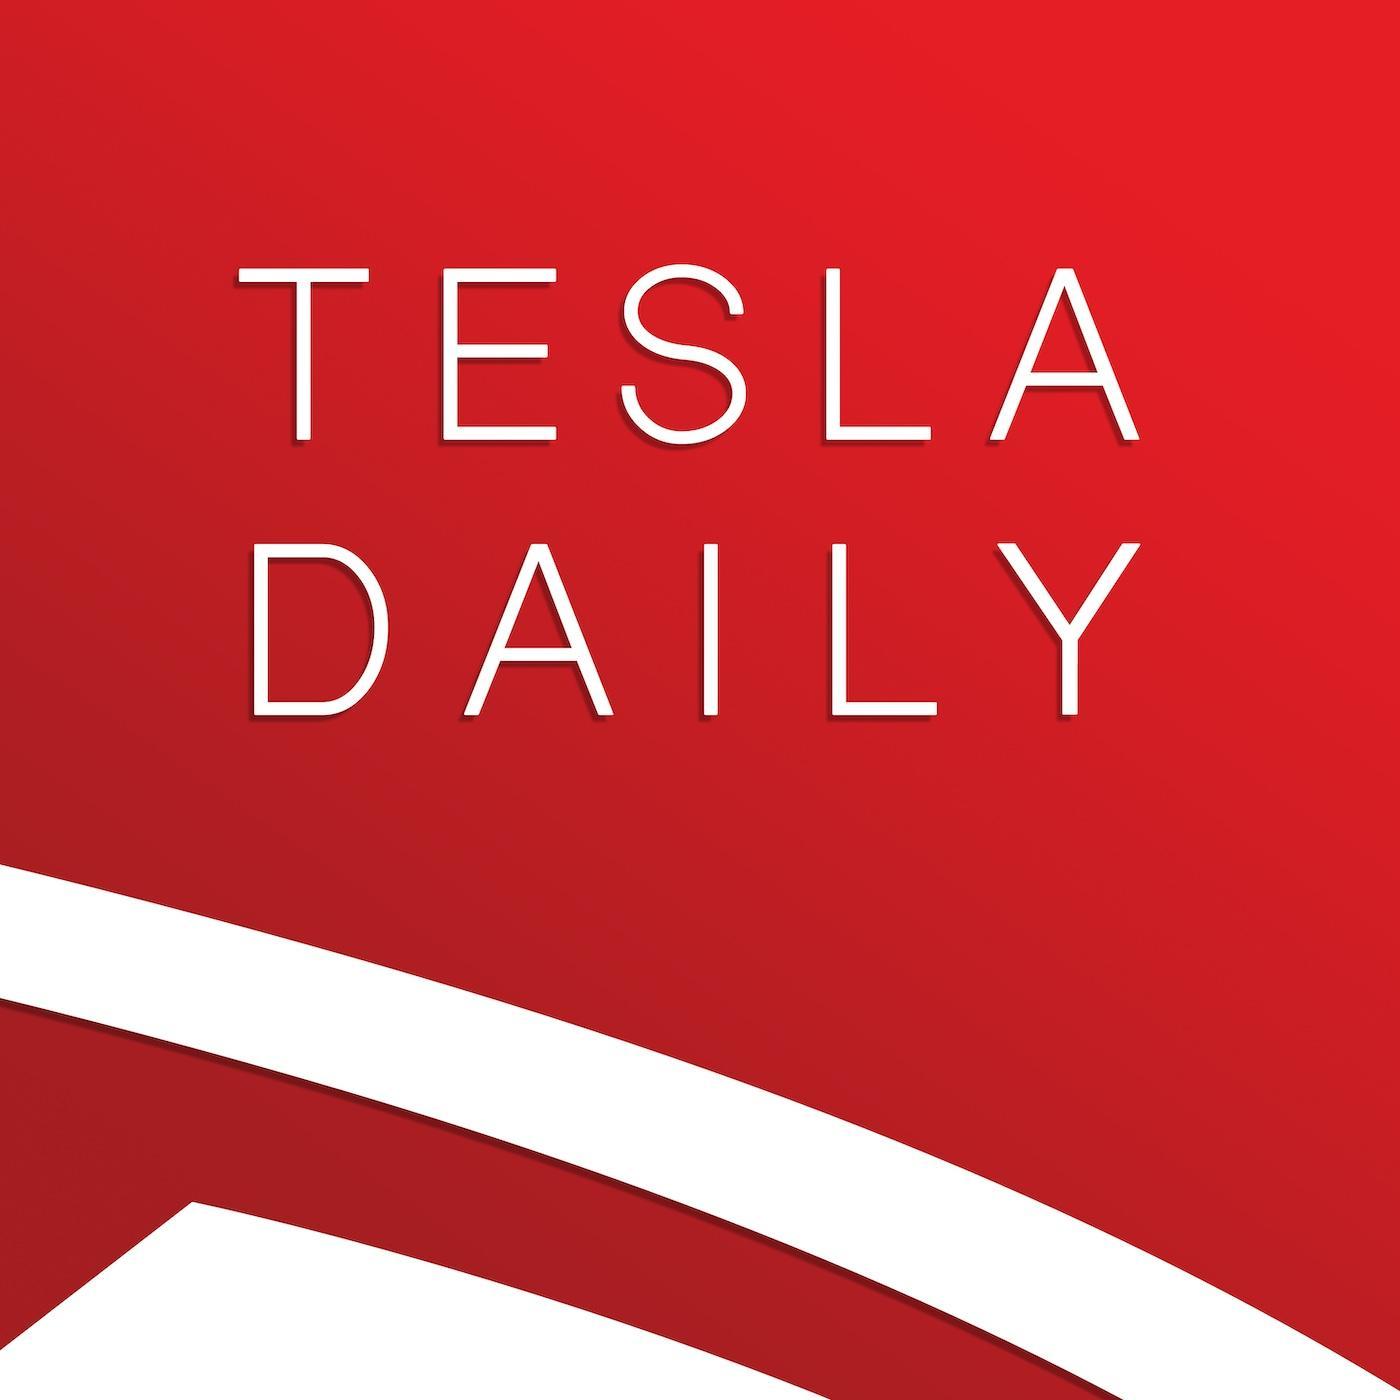 Morgan Stanley Ups TSLA Price Targets (07.07.20)